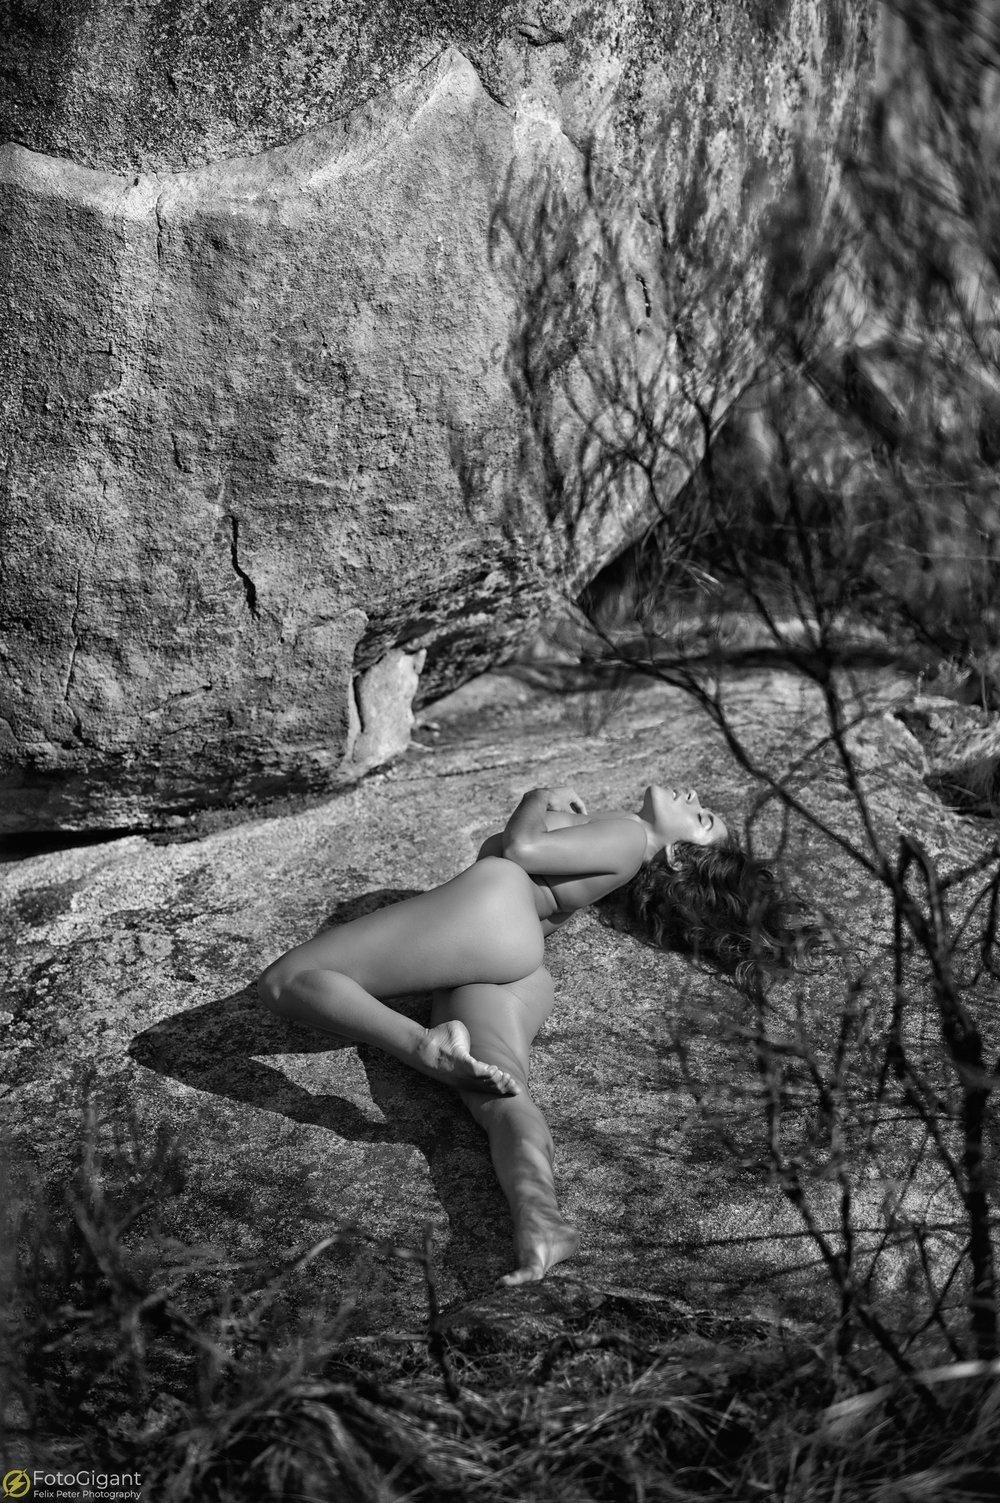 NudeArt_Aktfotografie_Eva-Luna_17.jpg